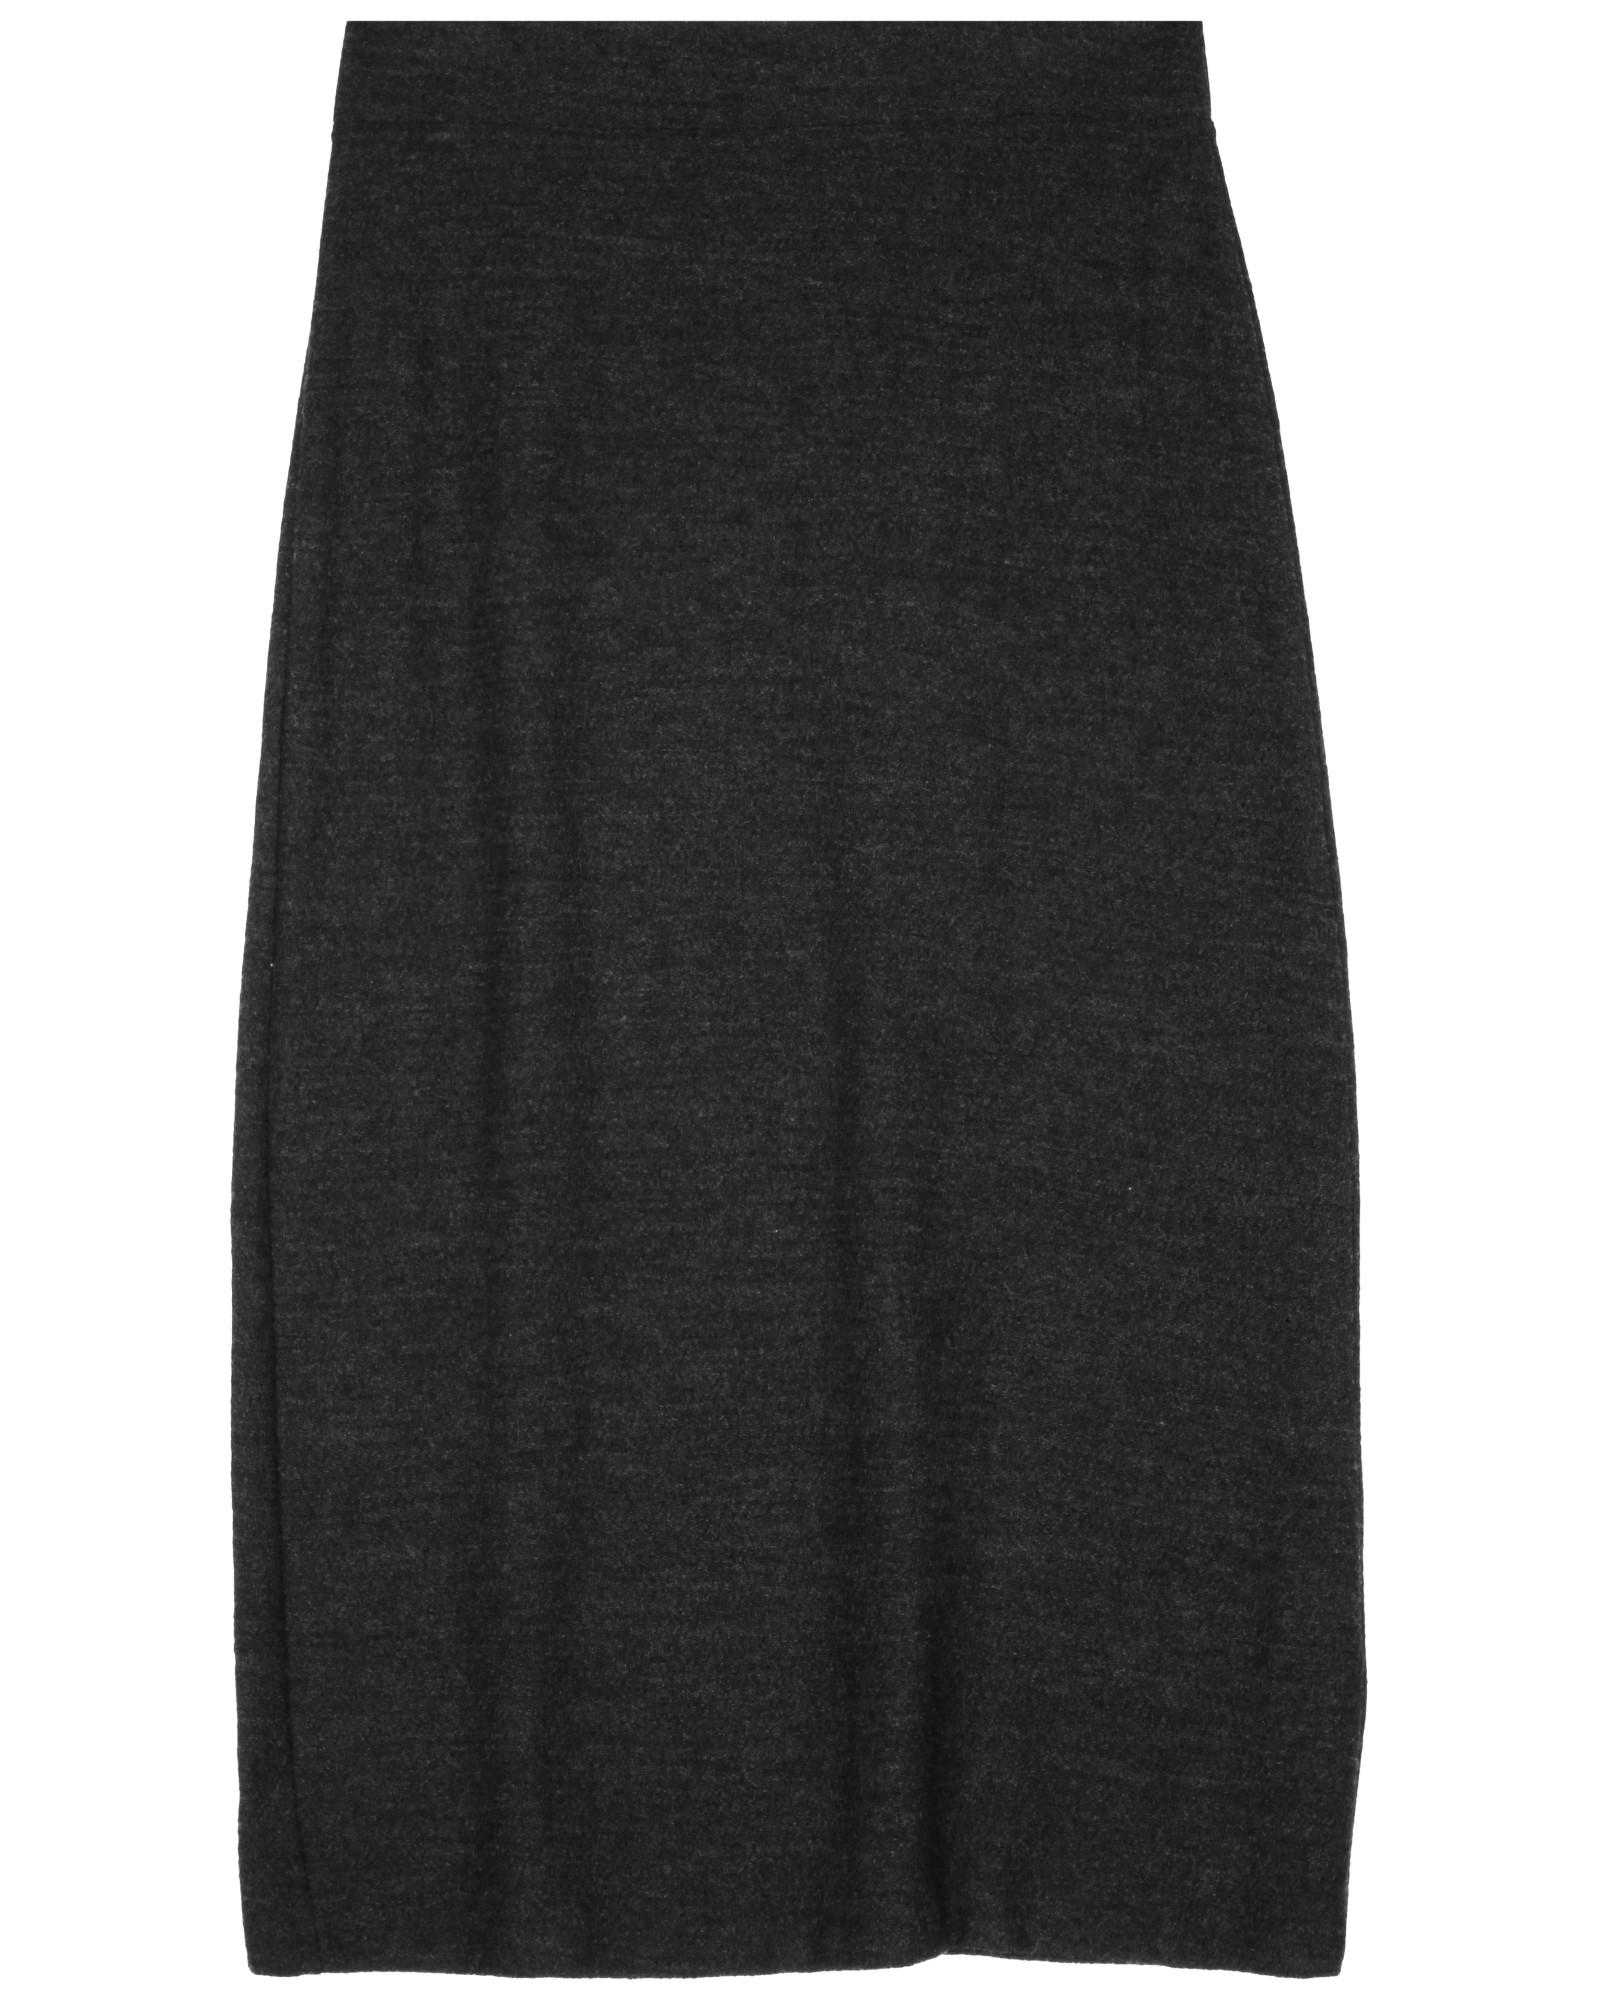 Knitted Wool Skirt